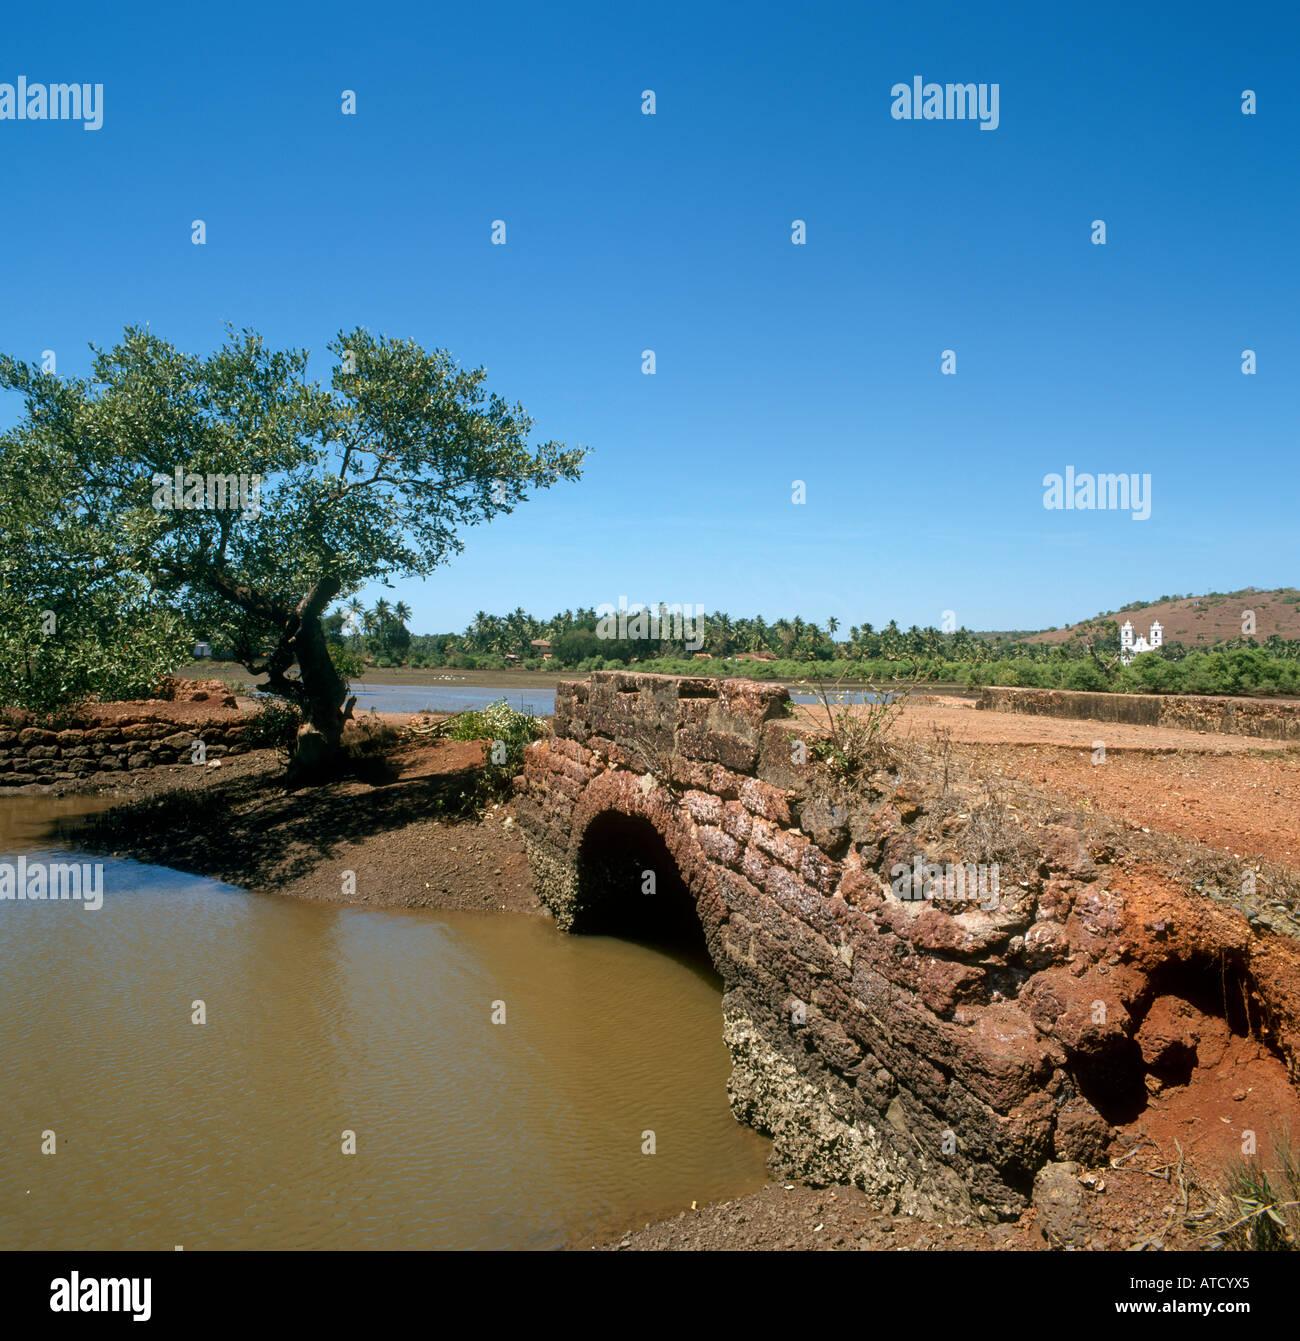 Old Stone Bridge, Goa, India - Stock Image